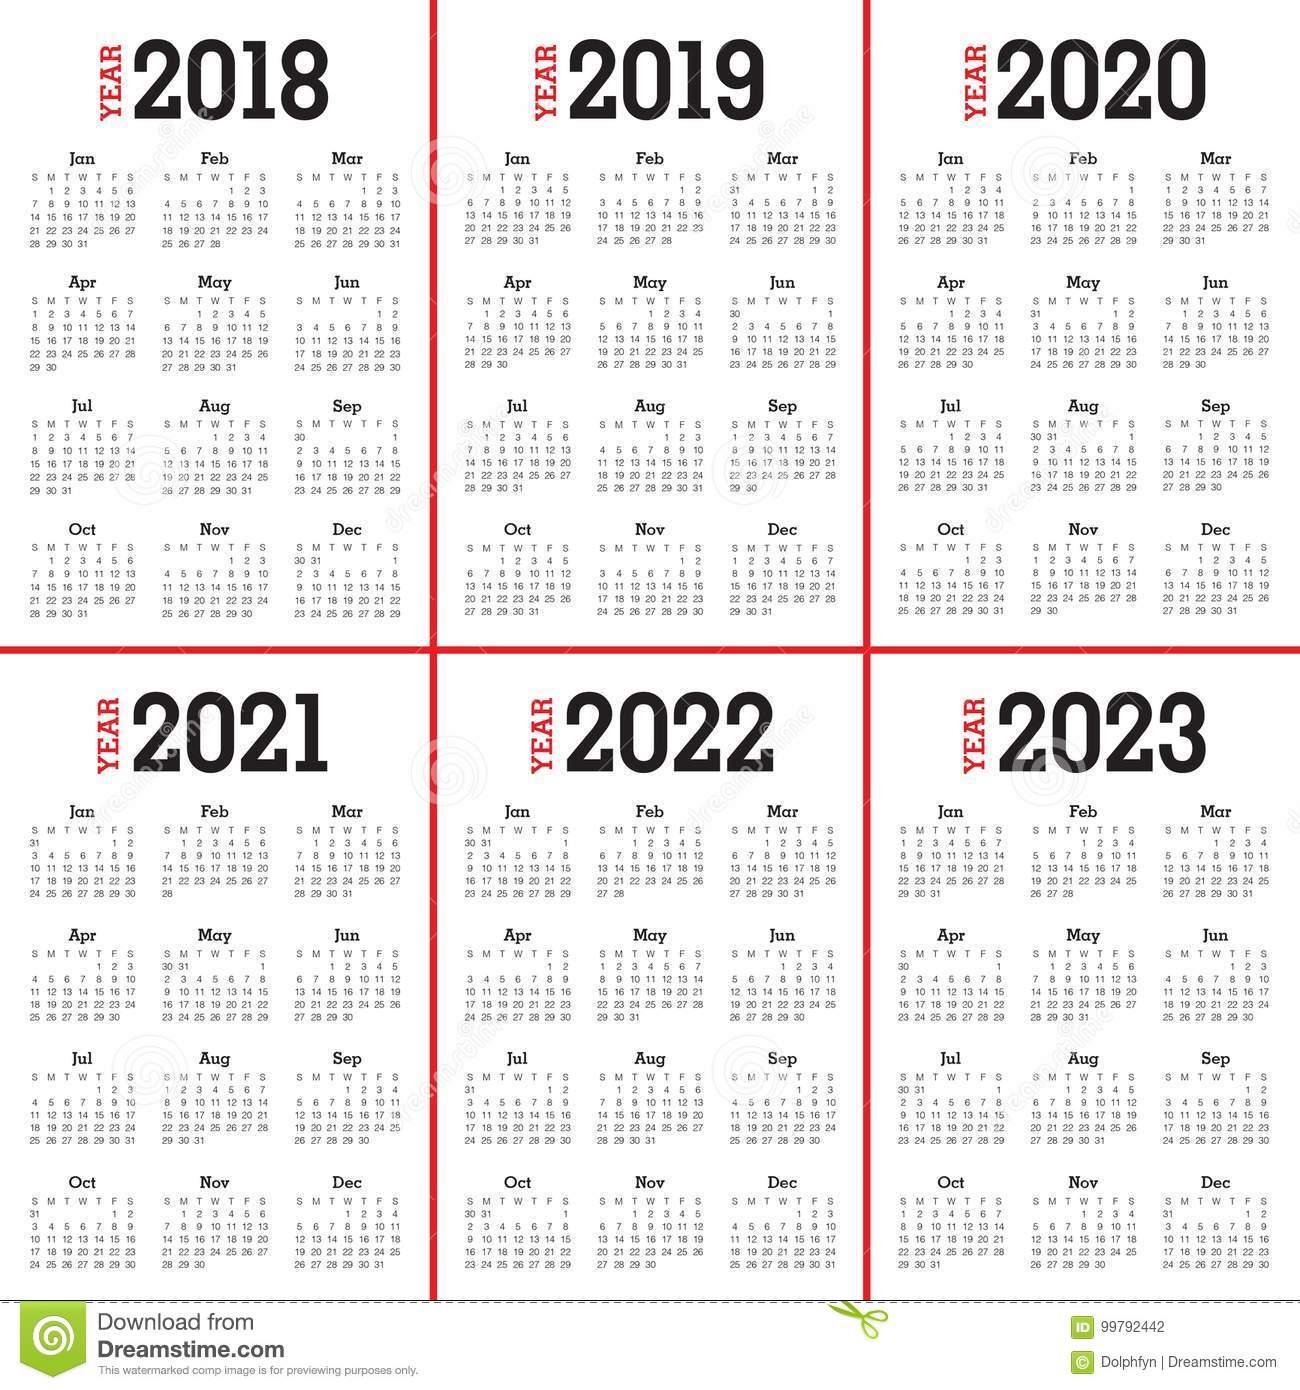 Year 2018 2019 2020 2021 2022 2023 Calendar Vector Stock Vector intended for 3 Year Calendar Printable 2018 2019 2020